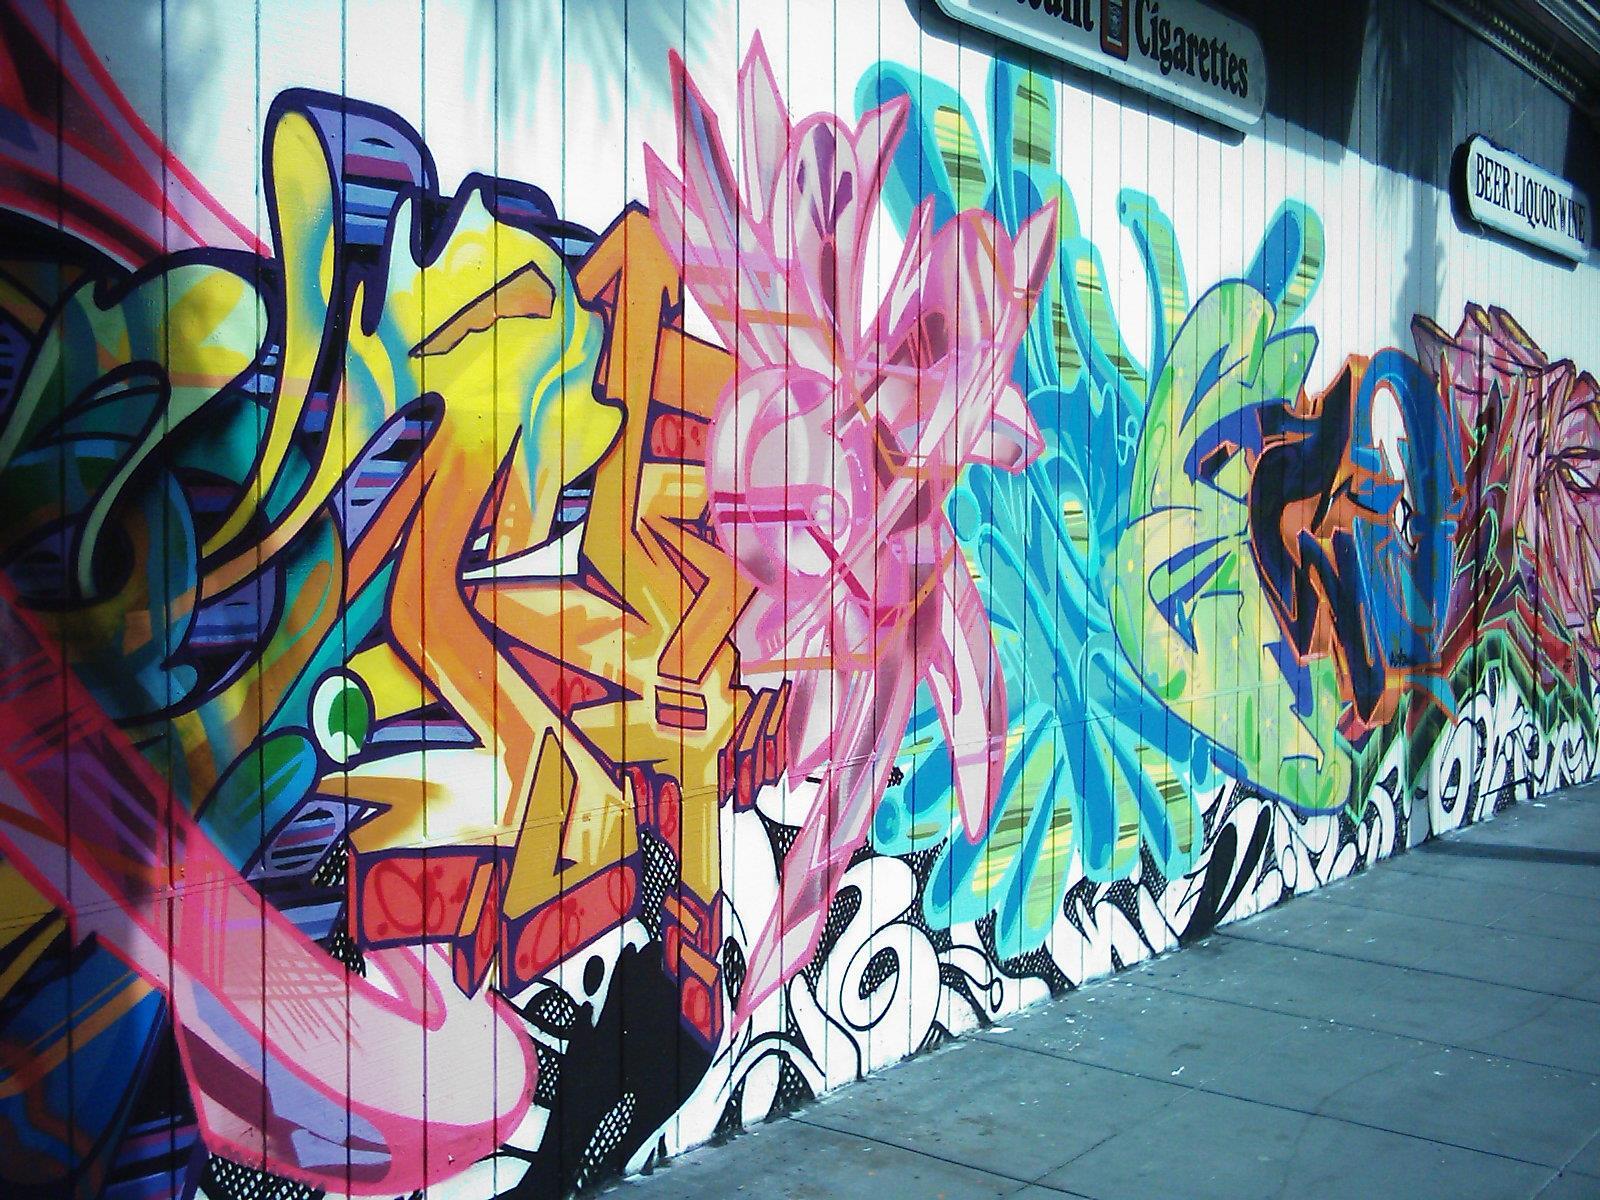 graffiti hintergrundebilder, graffiti bilder, graffiti wallpaper hd, coole graffiti hintergrundebilder kostenlos